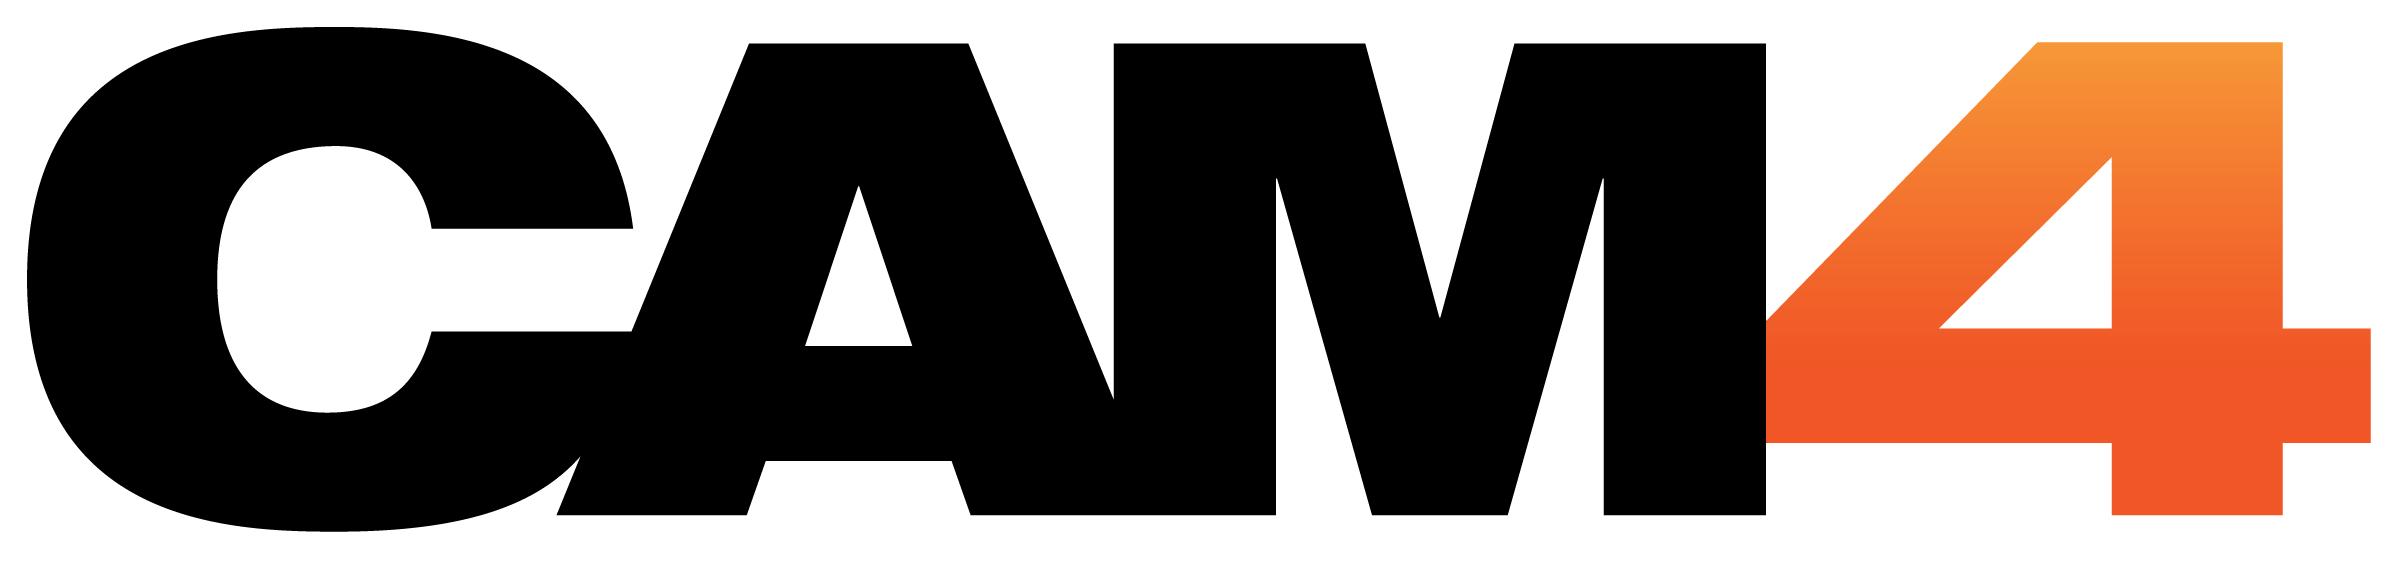 cams4